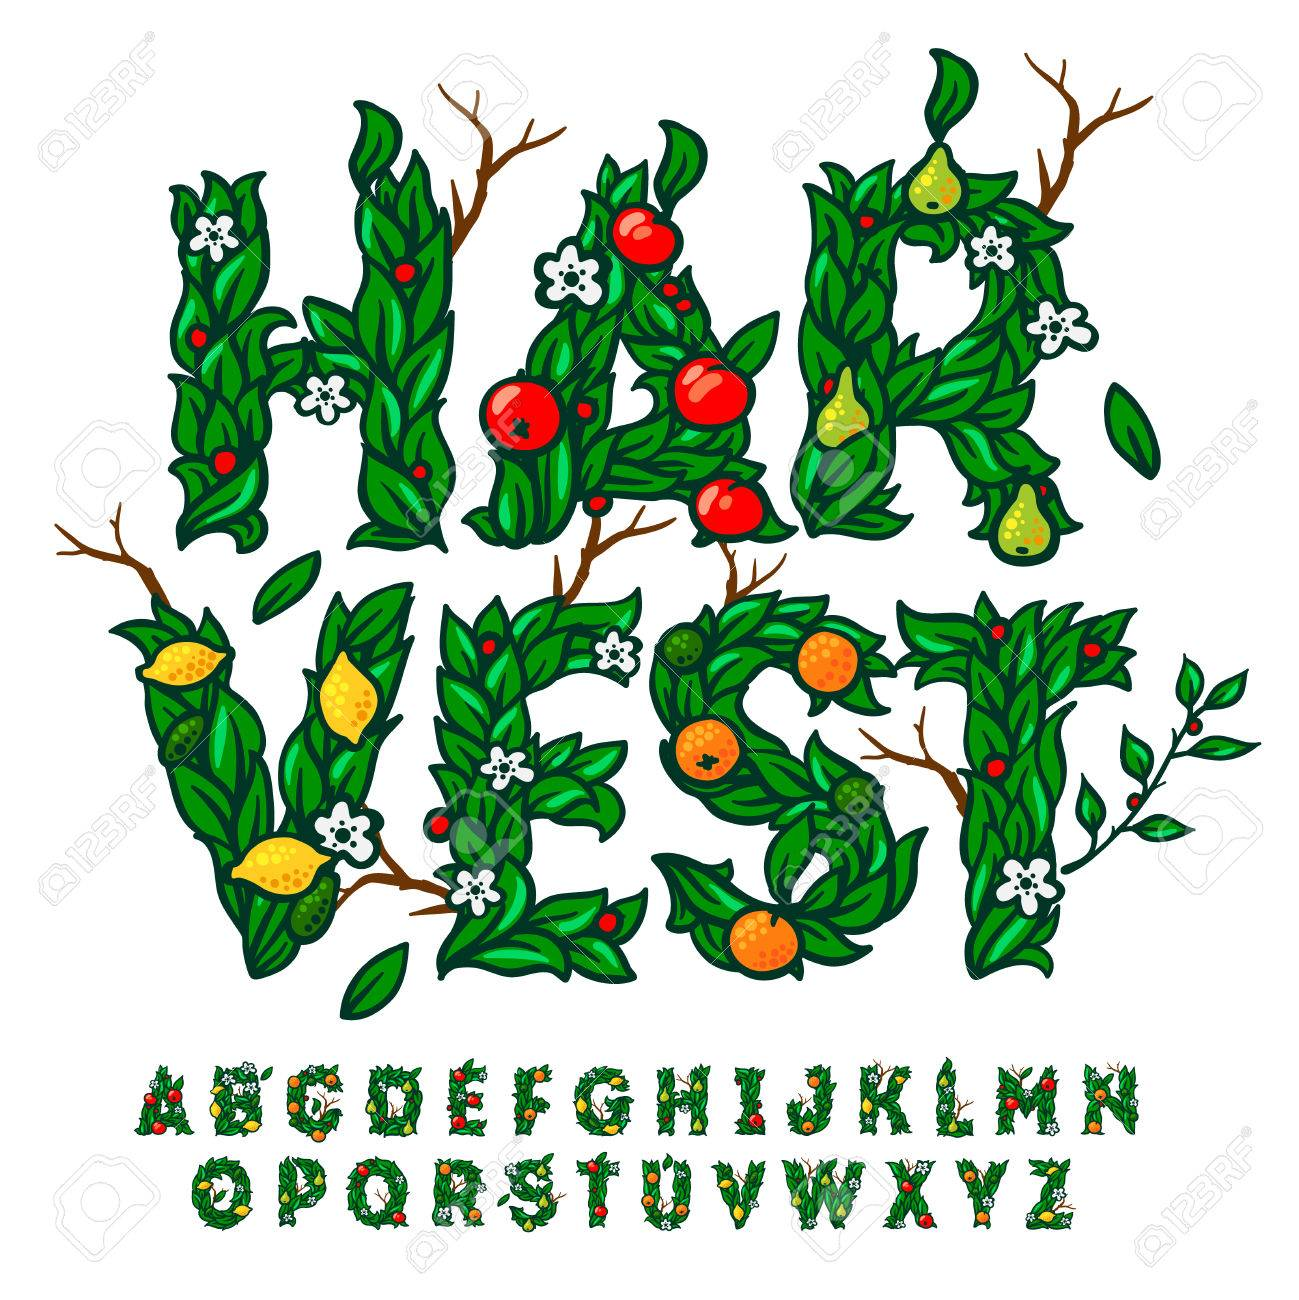 Alphabet made with leaves and fruits, use for fall harvest festival design, vector illustration. Standard-Bild - 47657789